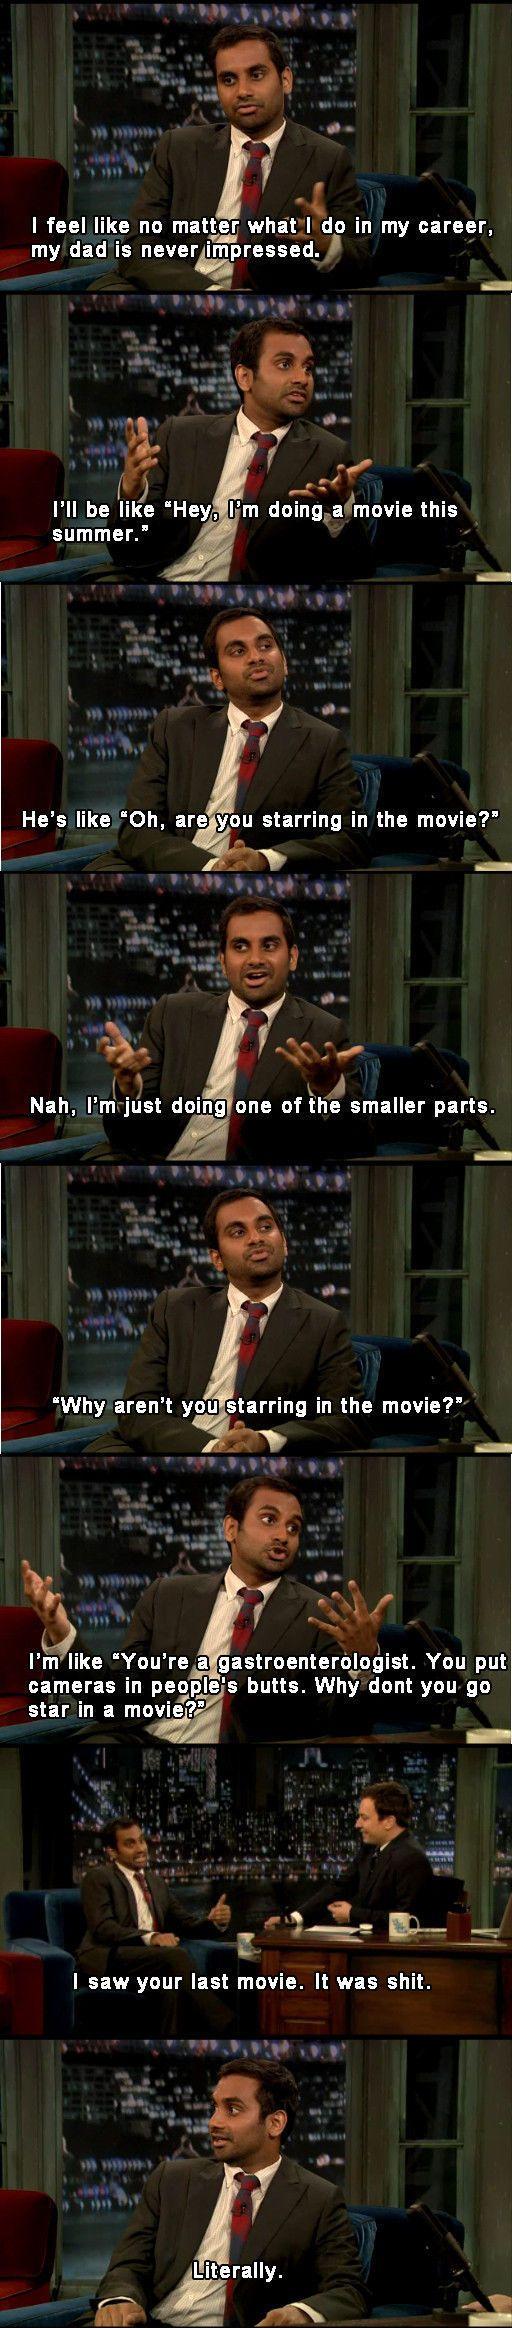 Aziz Ansari, he's funny.